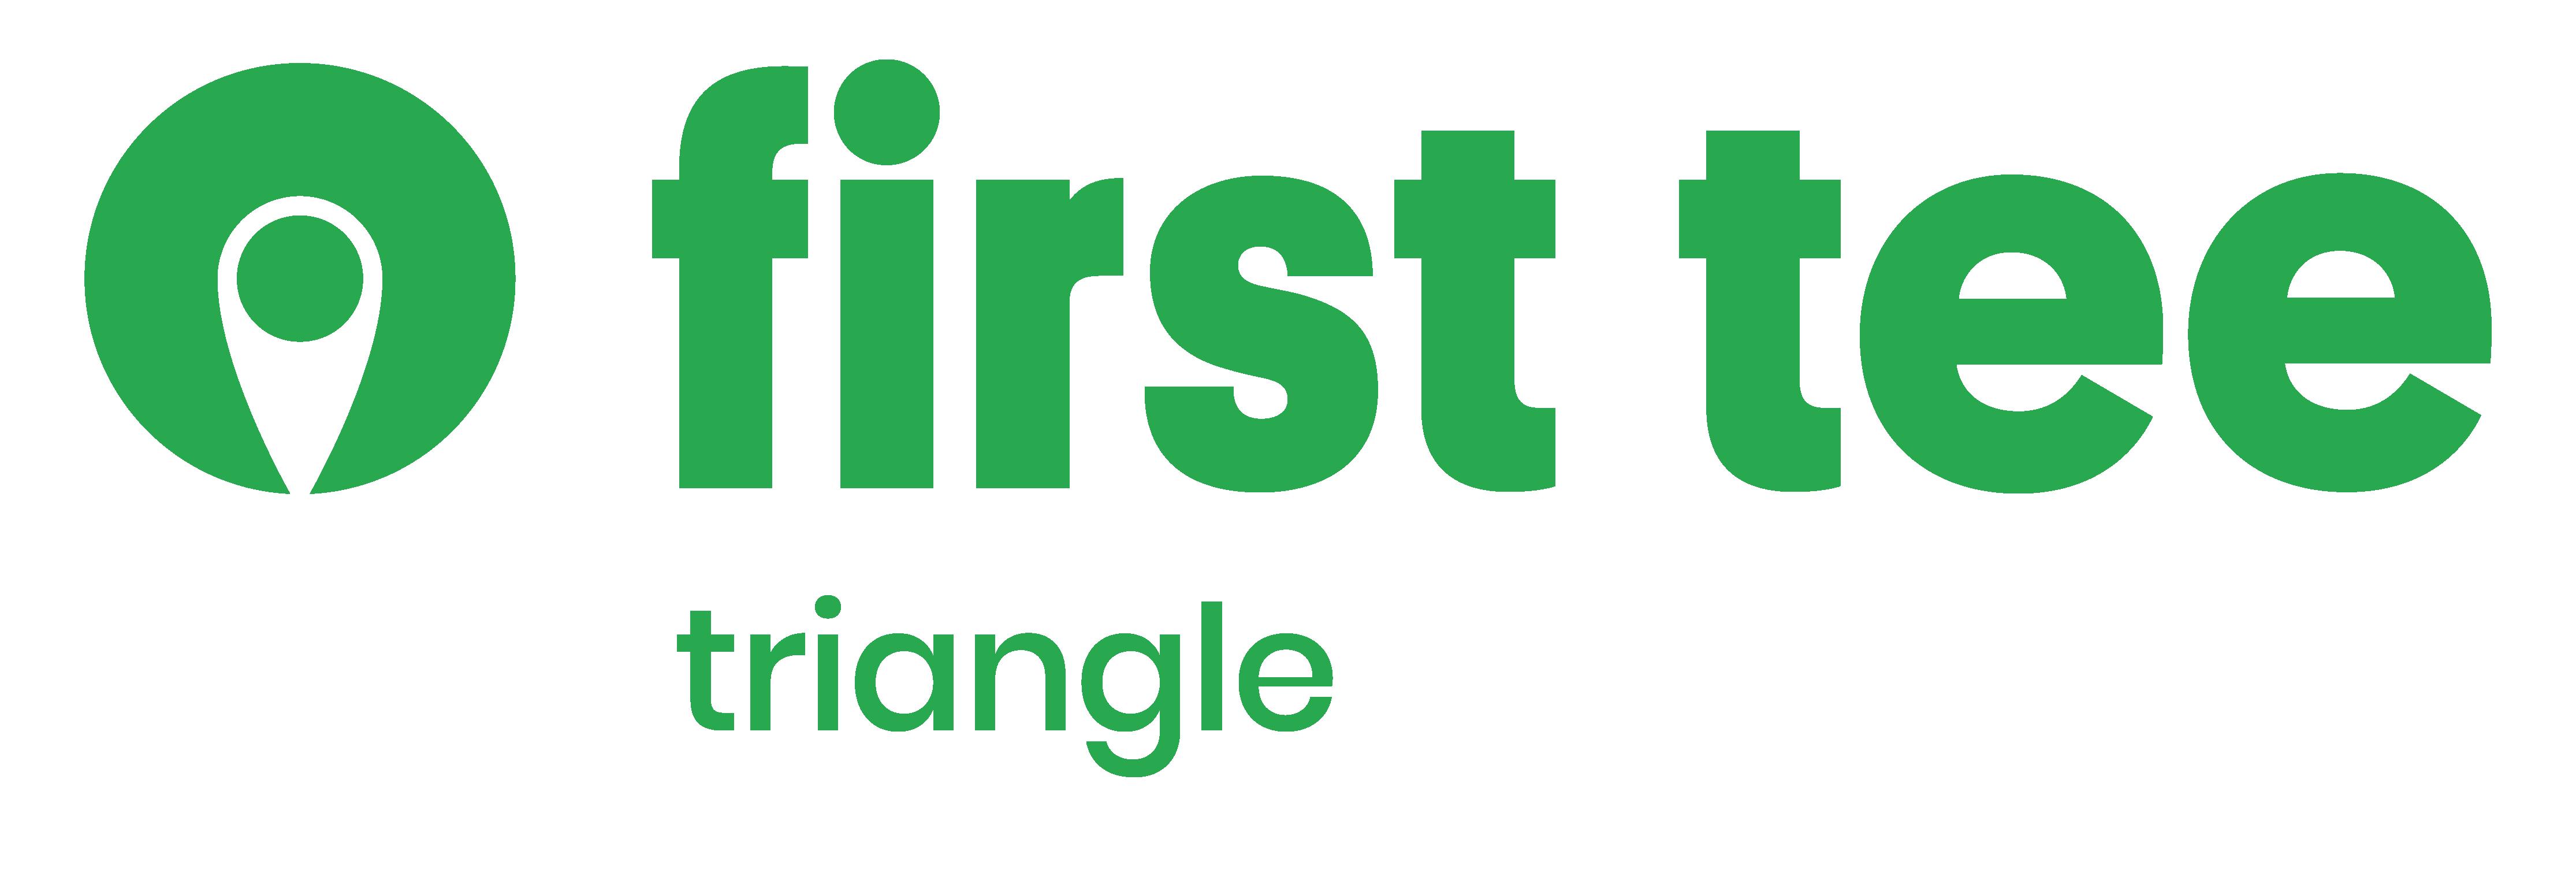 First Tee — Triangle logo